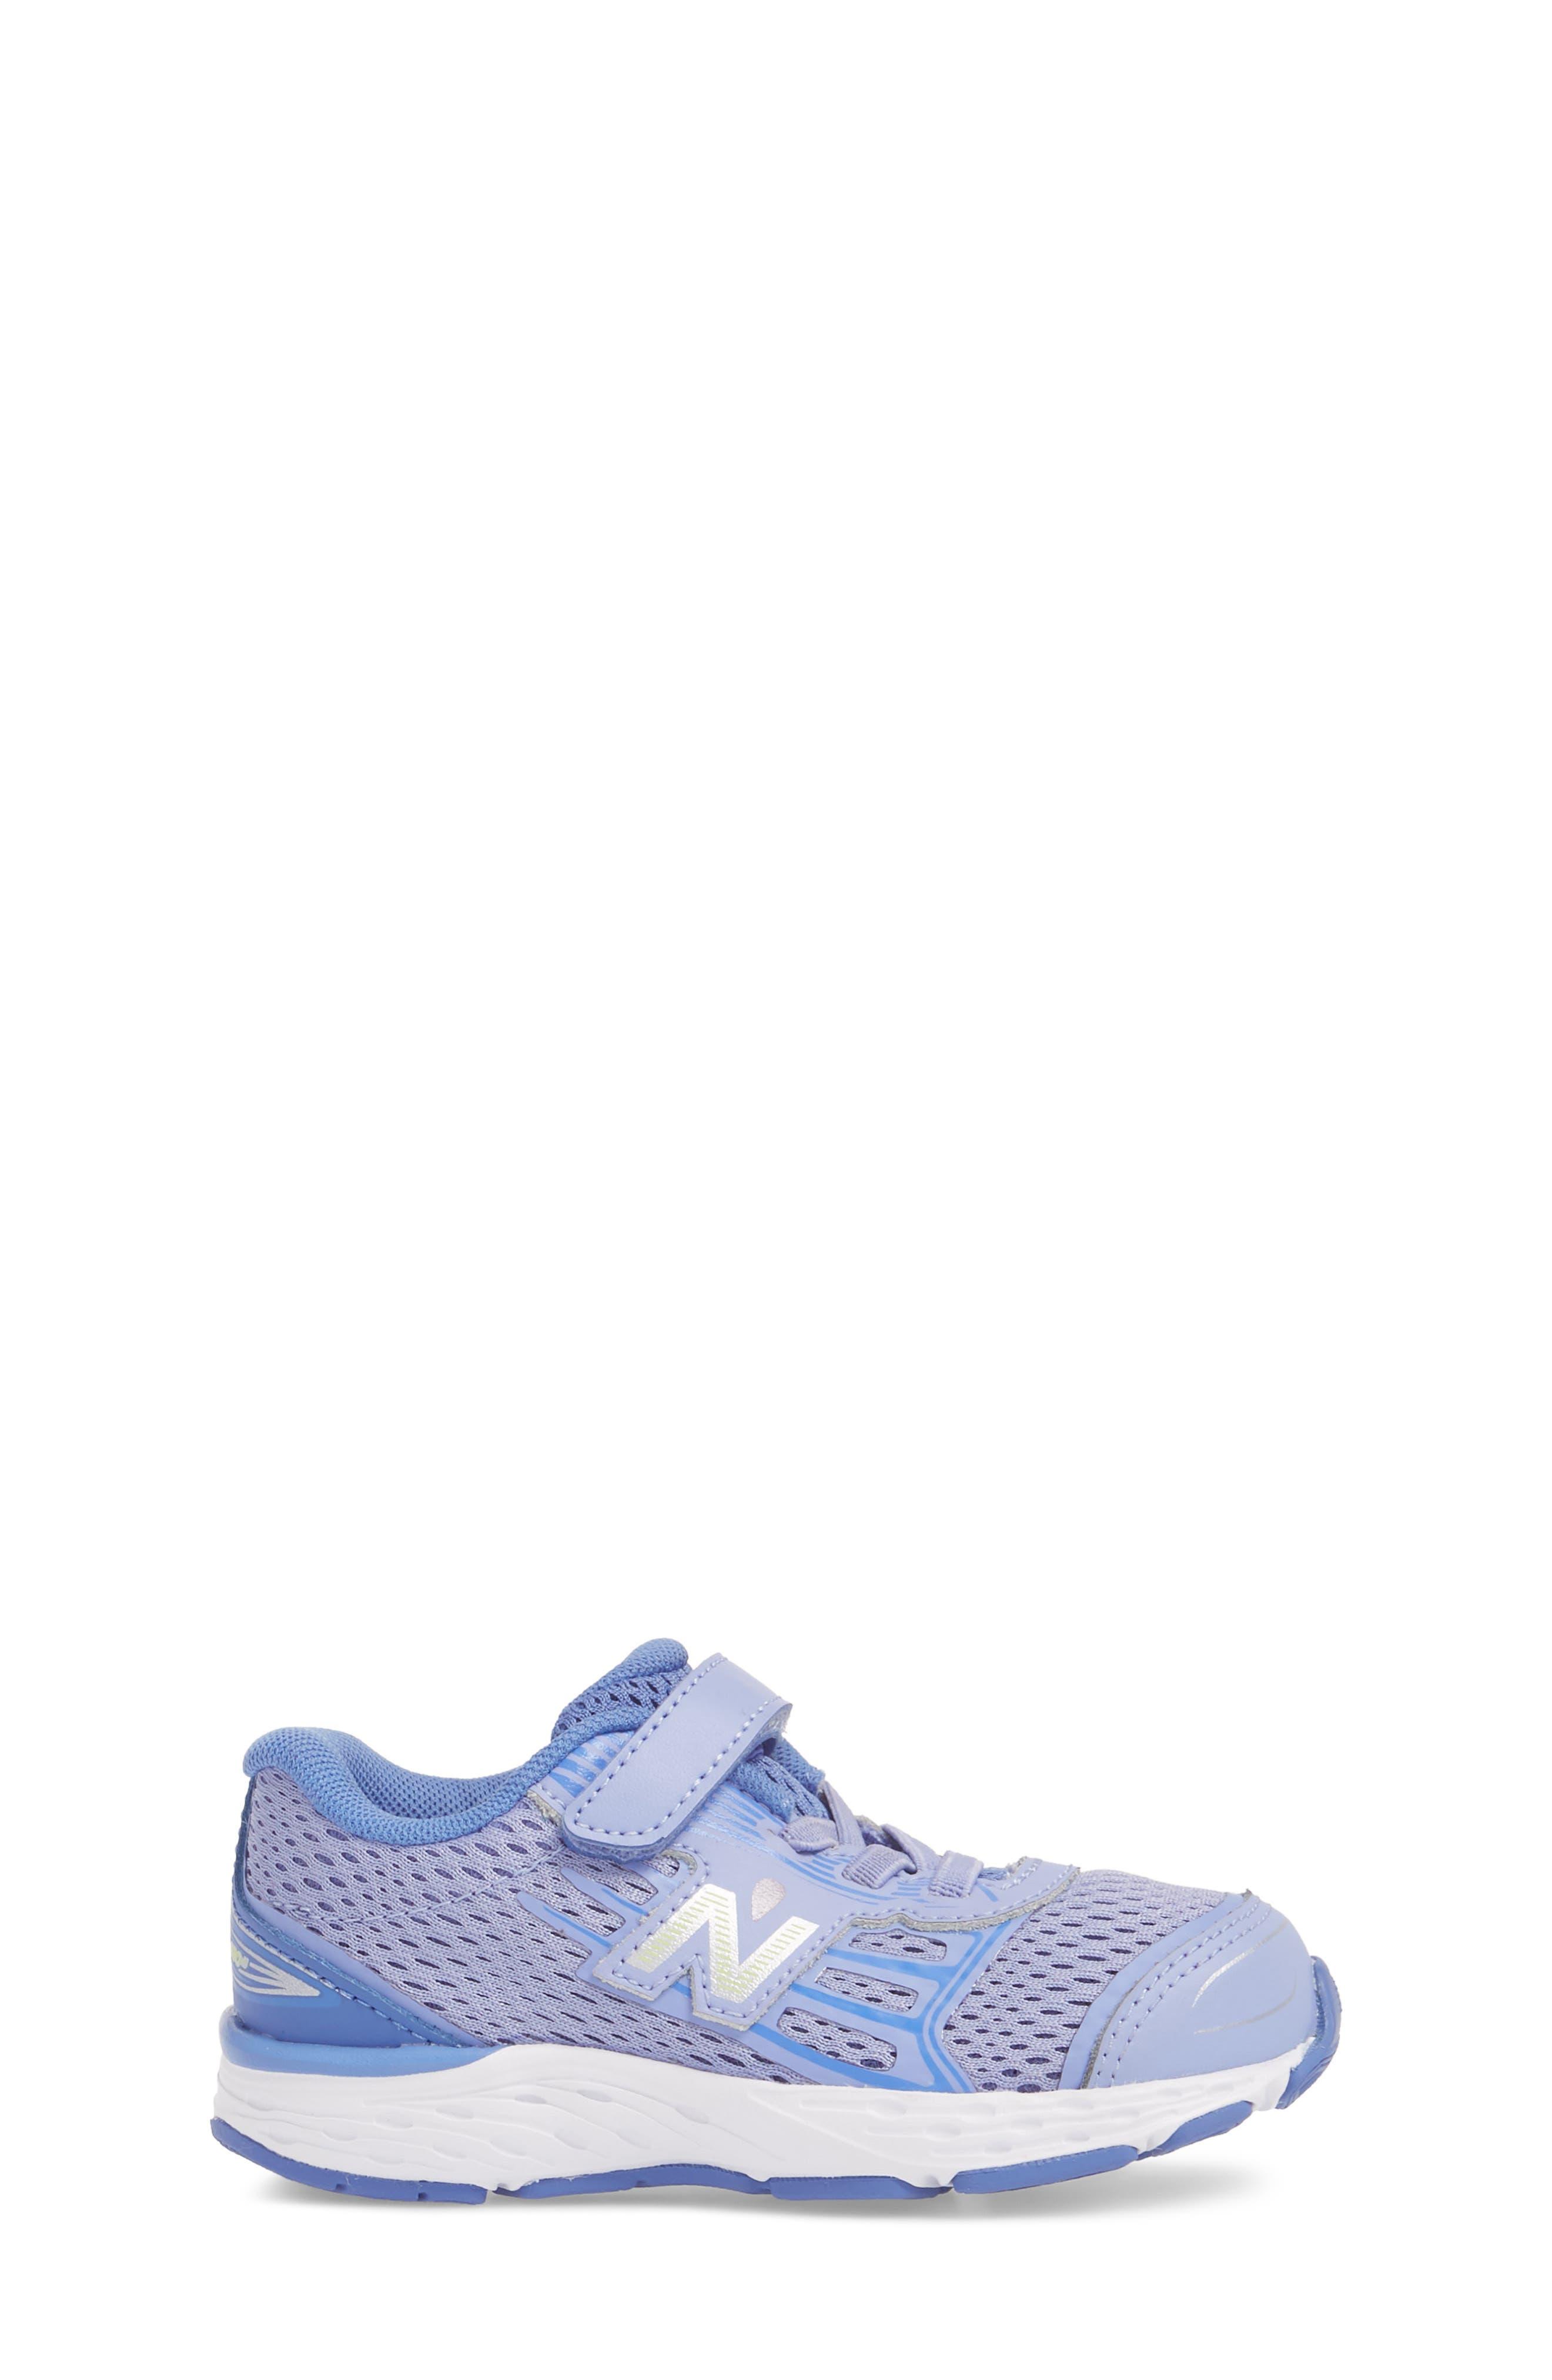 680v5 Sneaker,                             Alternate thumbnail 3, color,                             ICE VIOLET